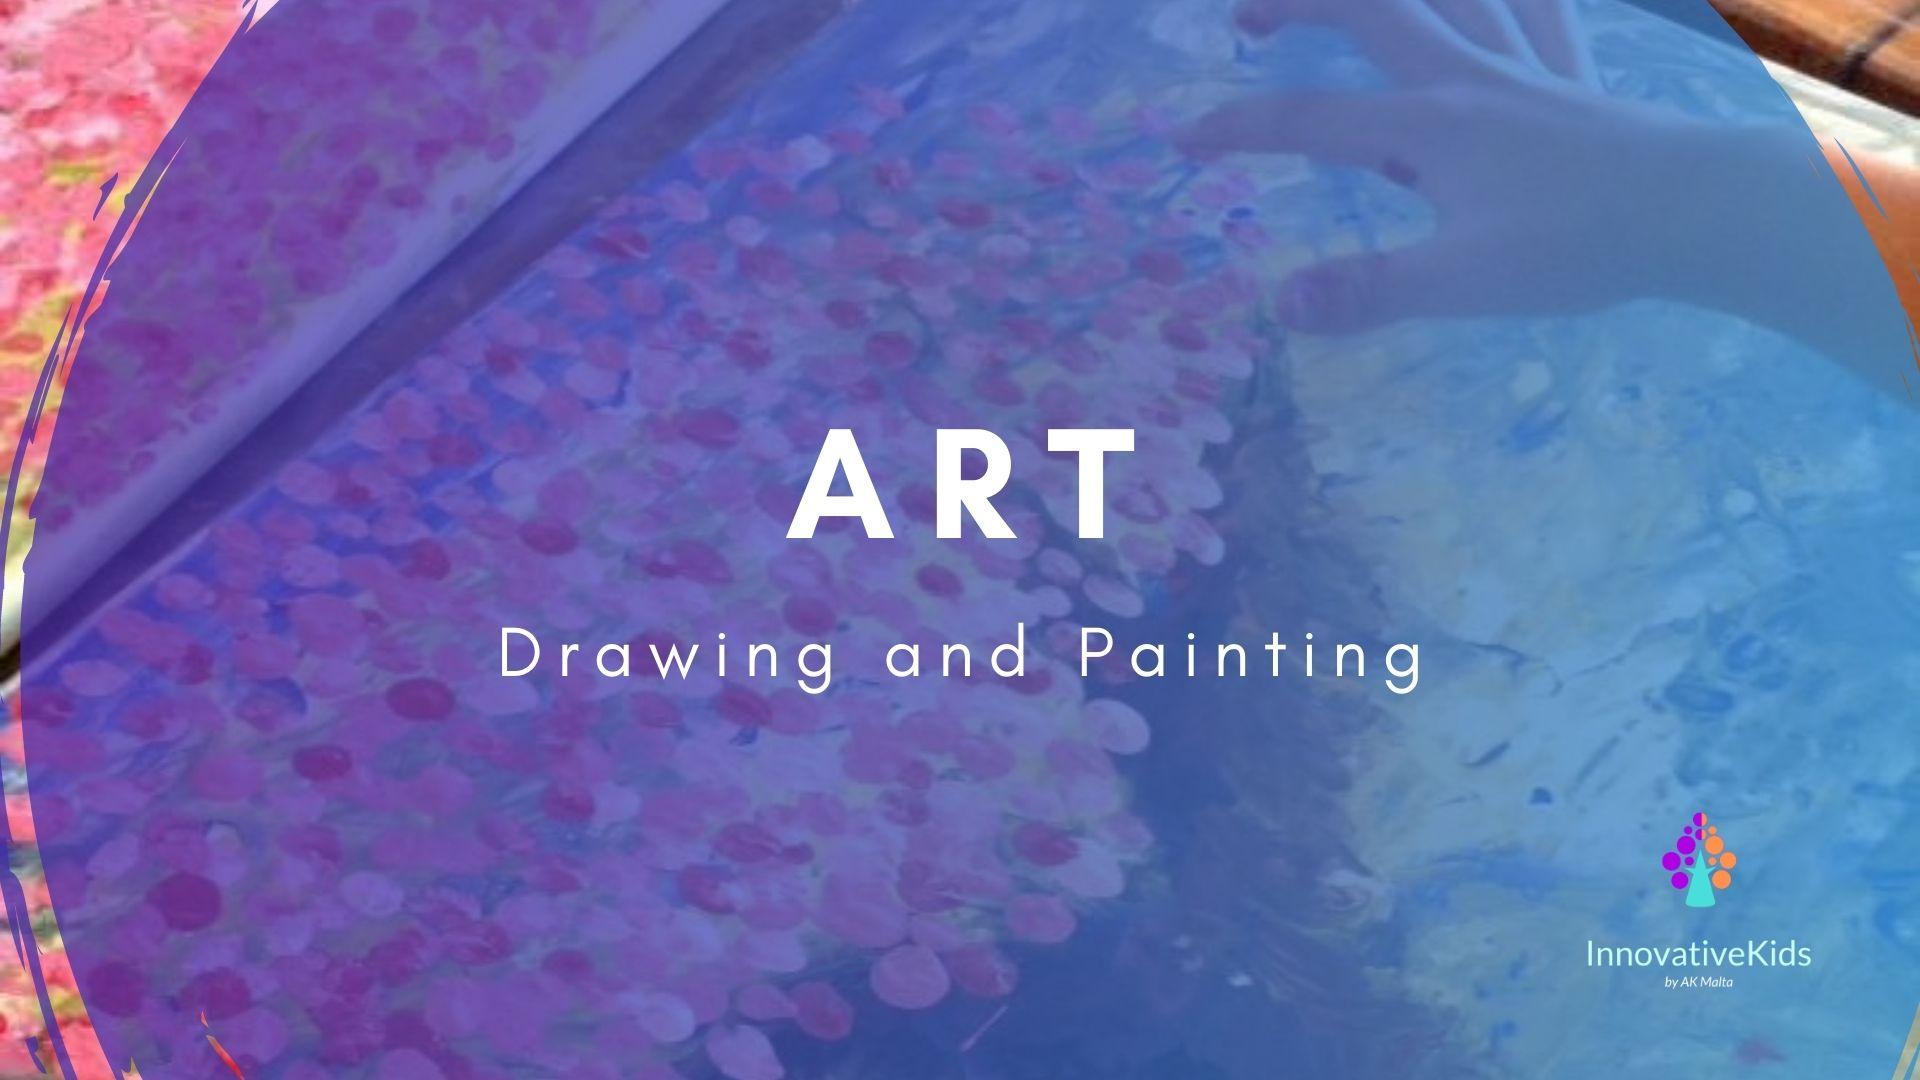 Summer Art Course - Art Classes Malta